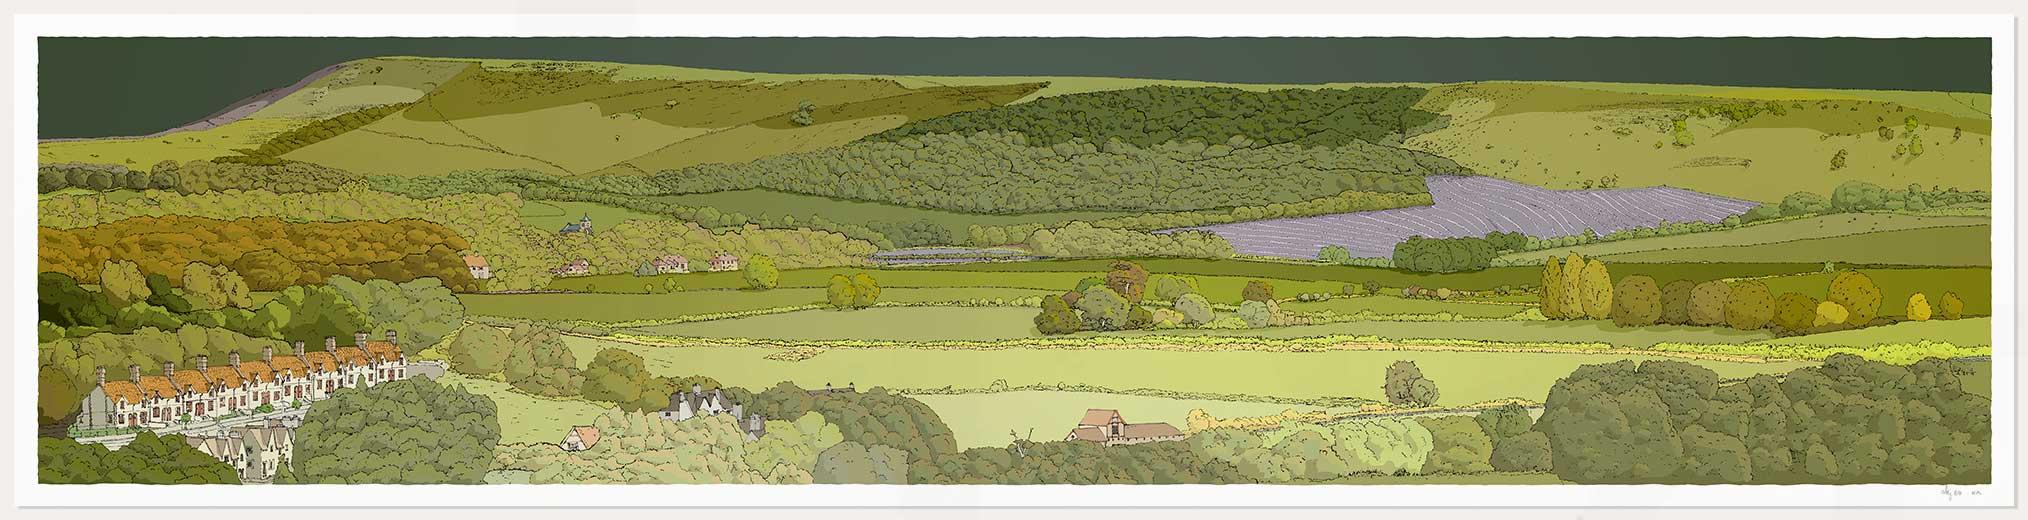 print named Firle from Glynde Green Sky by artist alej ez